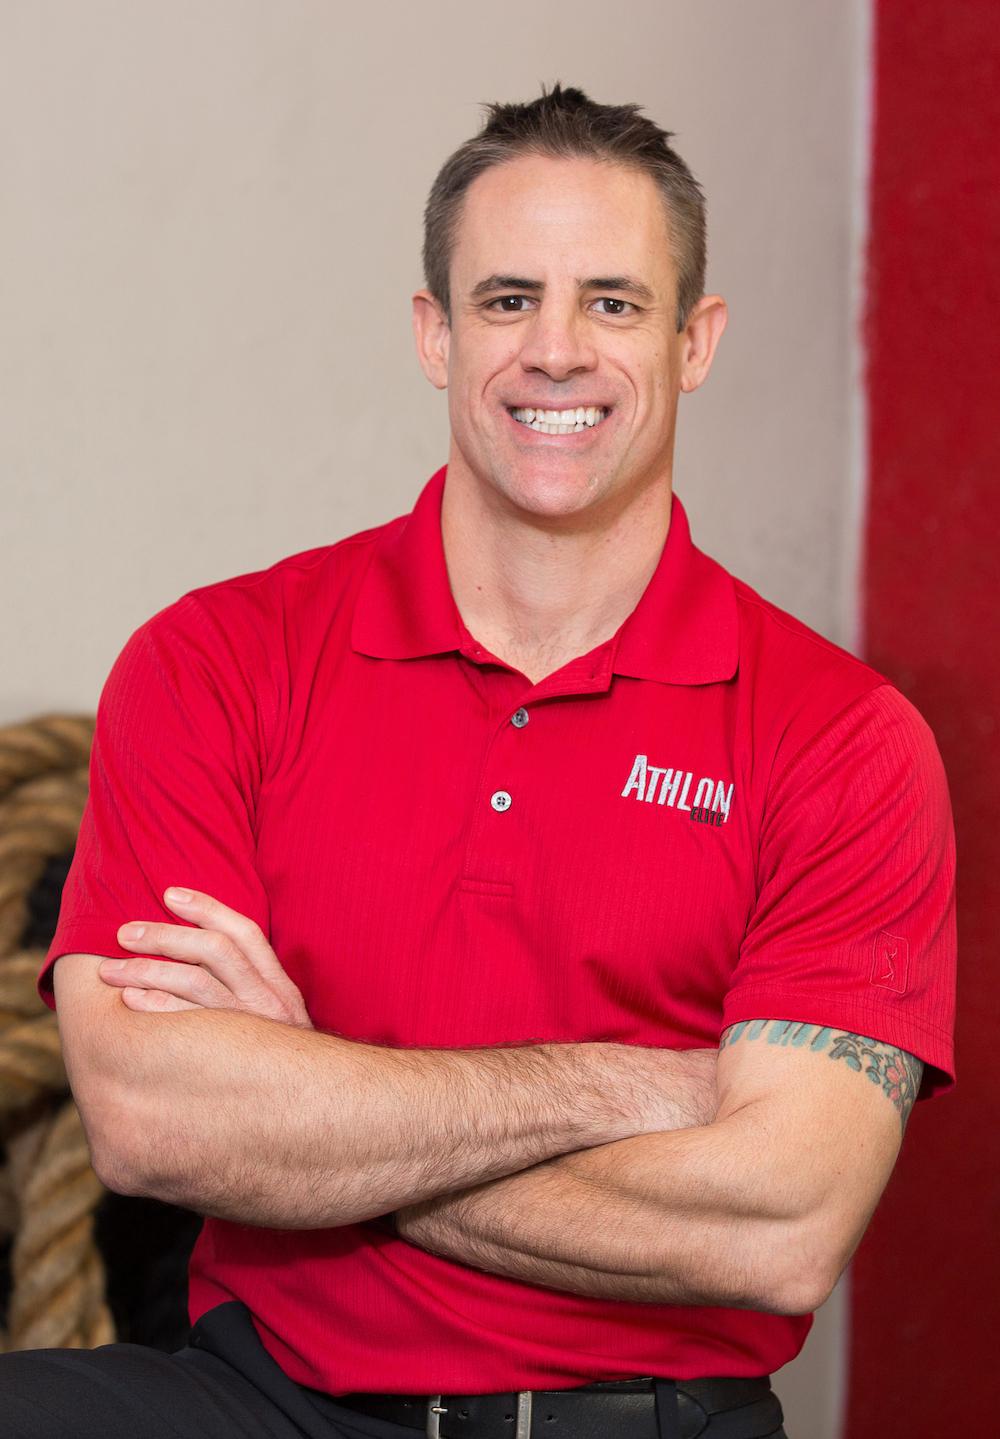 Ryan Joiner Athlon Trainer Pic